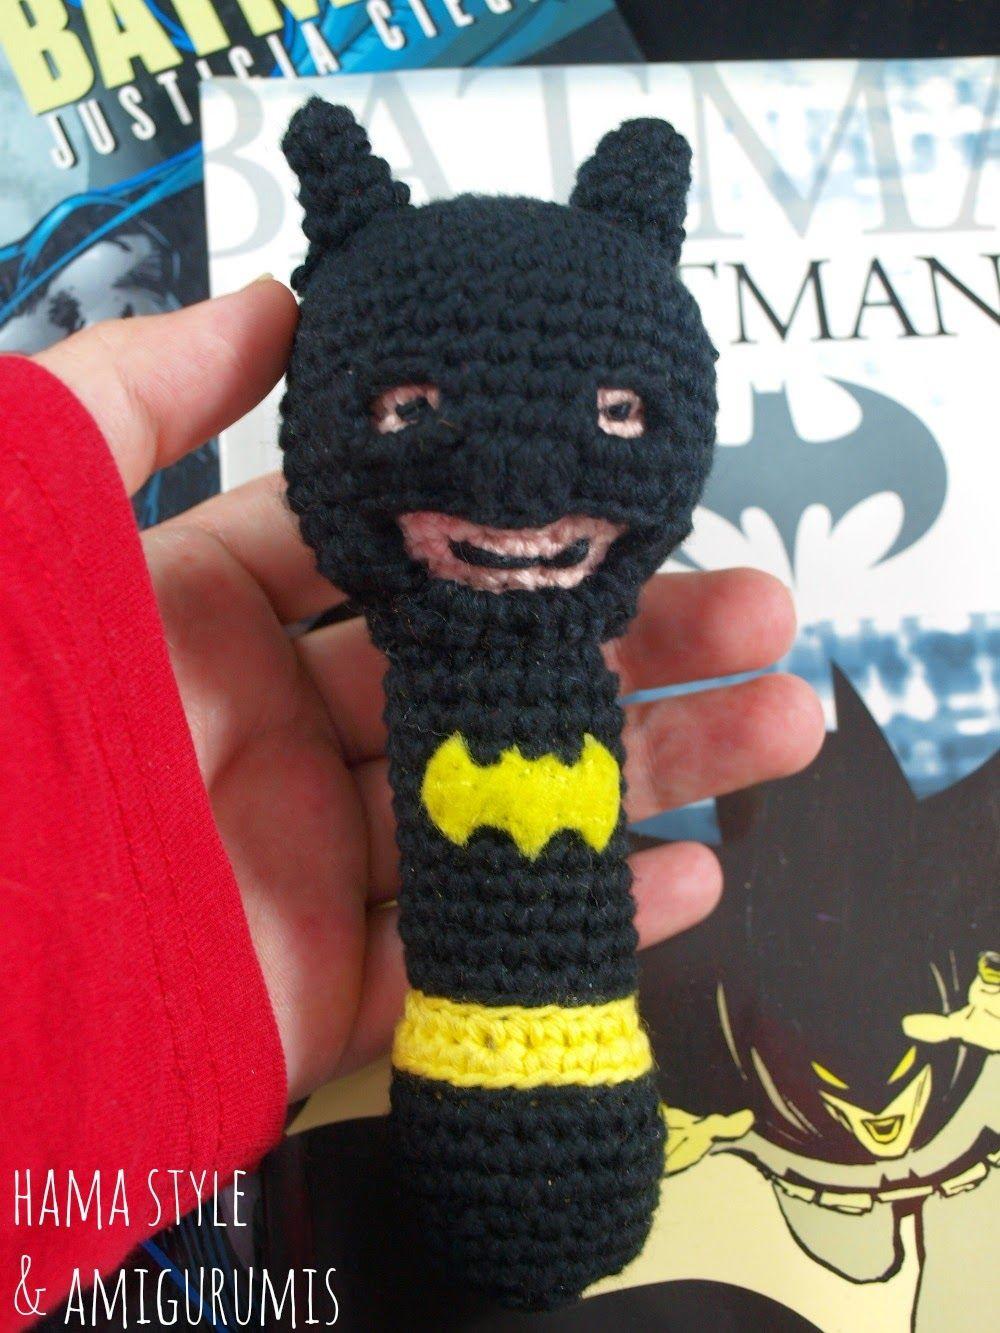 Hama Style & Amigurumis: Sonajero Batman - [PATRÓN GRATIS]